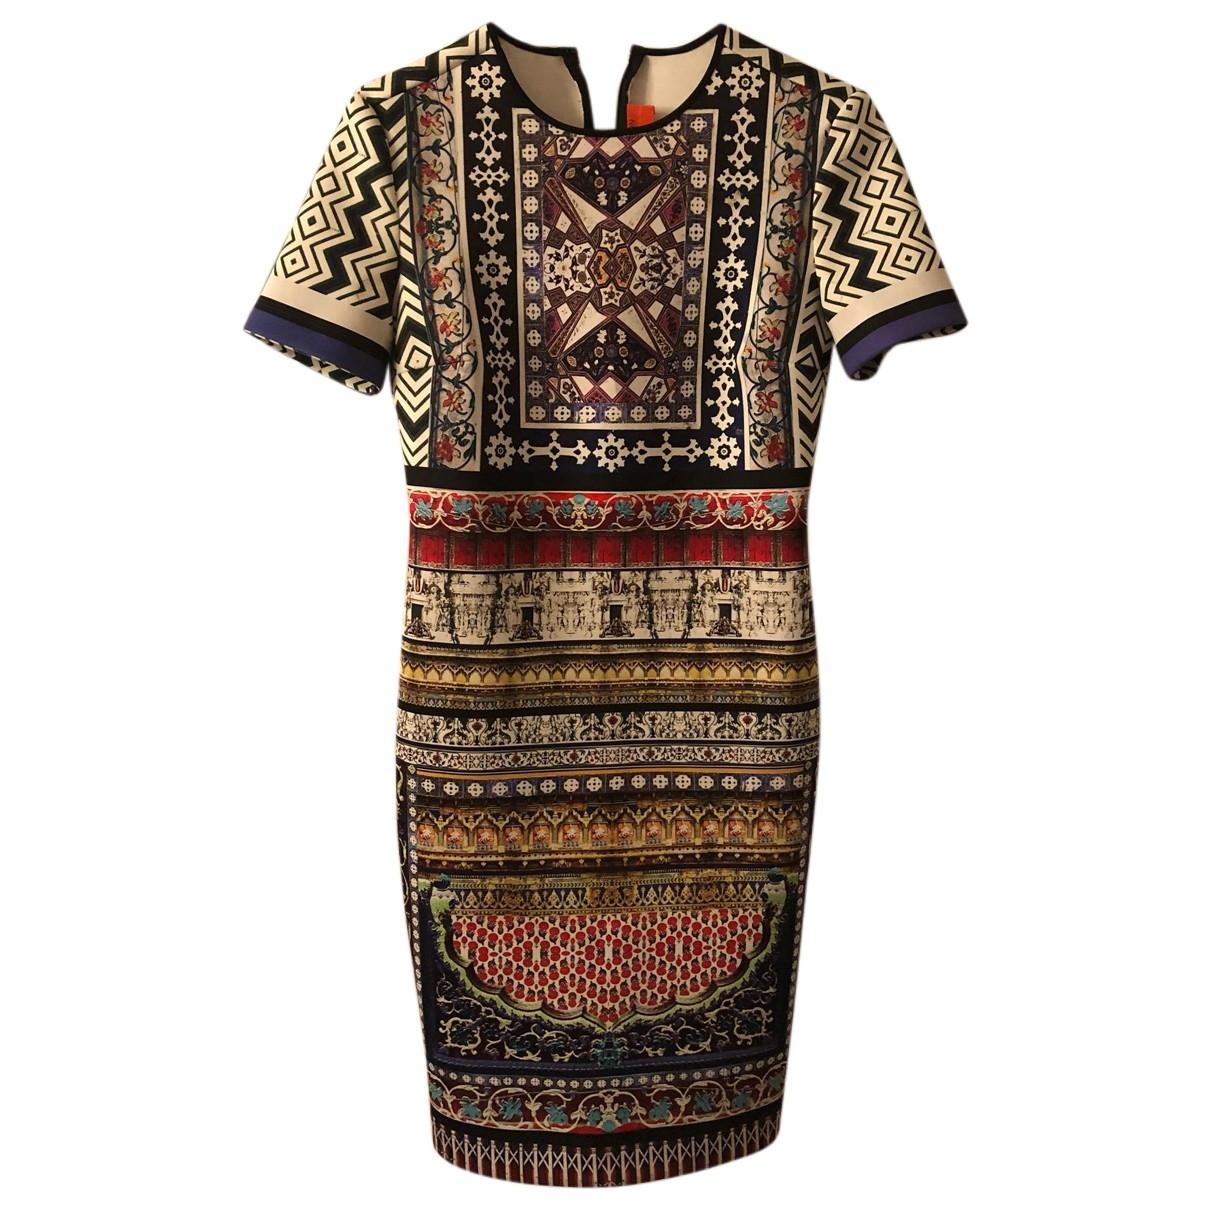 Clover Canyon \N Multicolour dress for Women S International